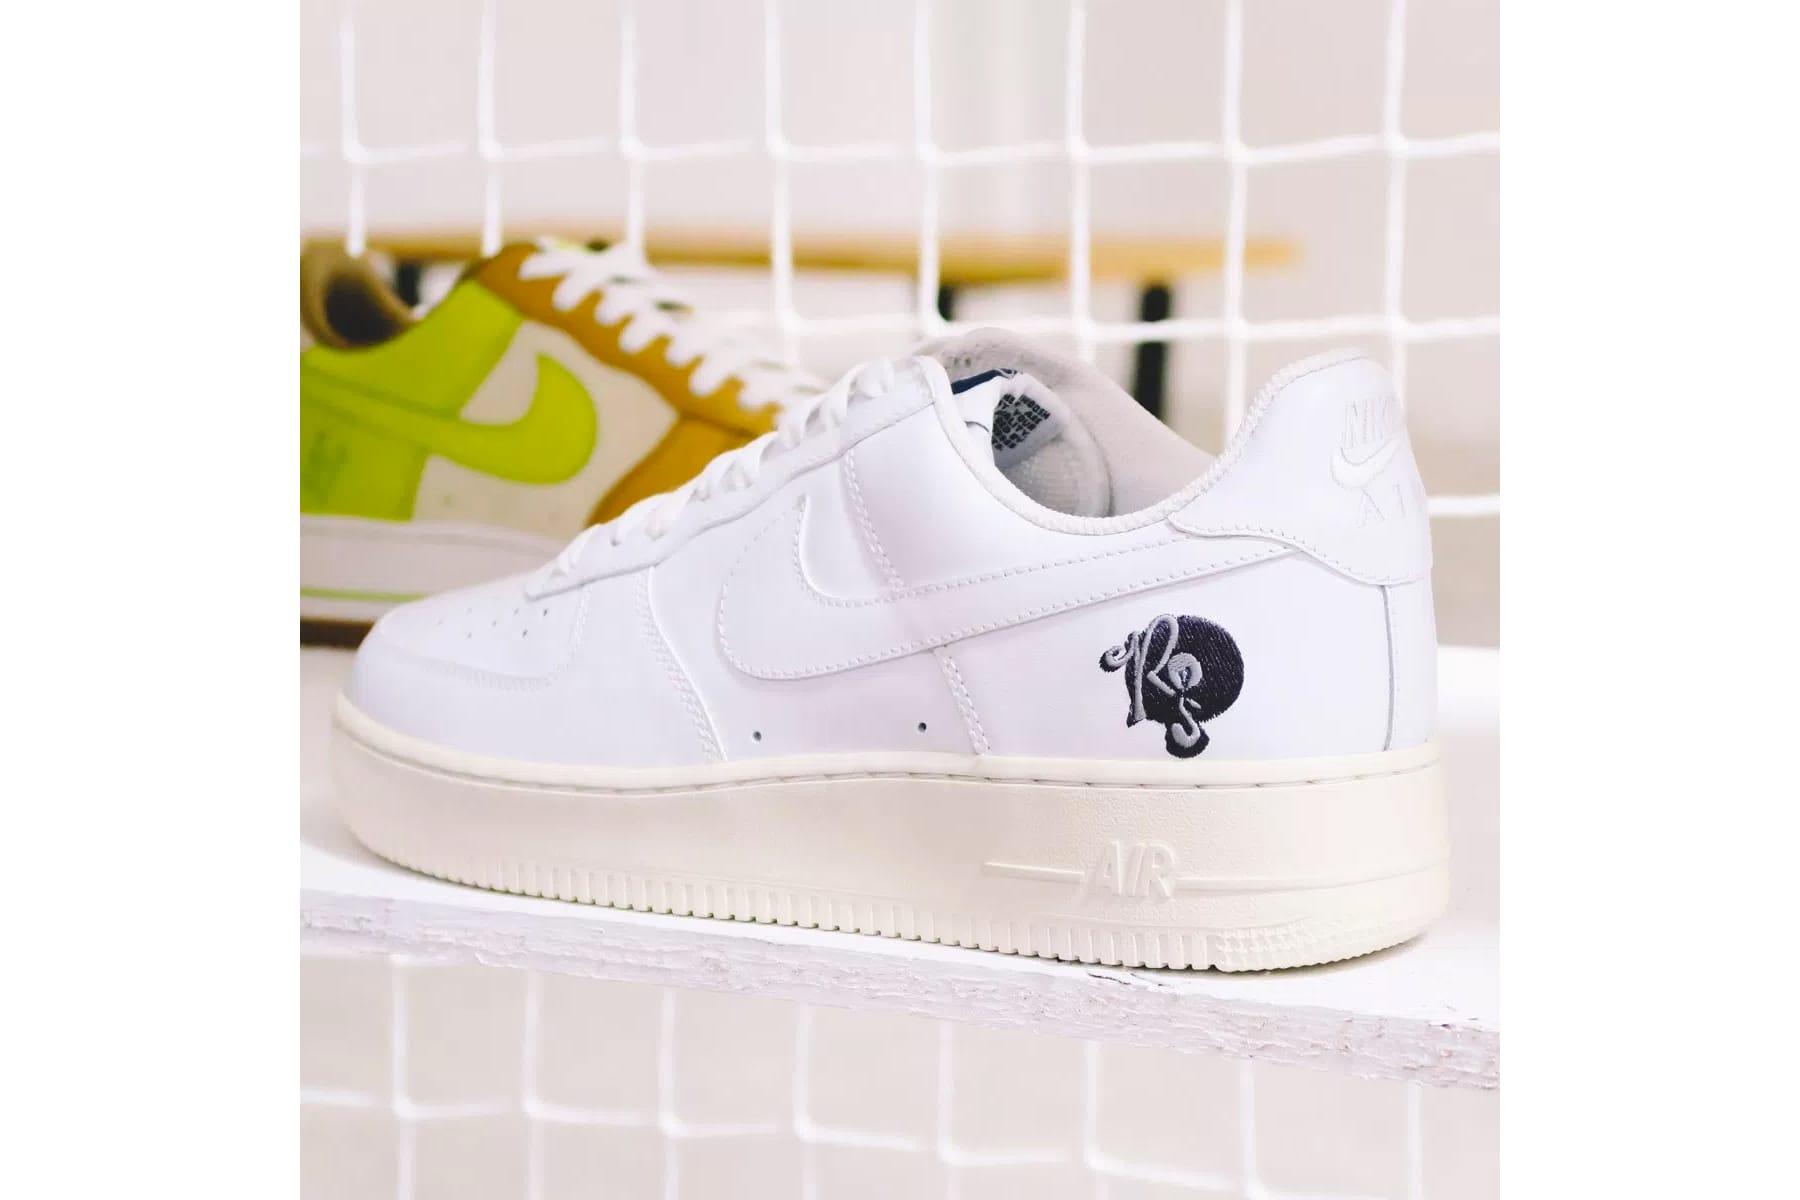 Roc-A-Fella x Nike Air Force 1 Retro